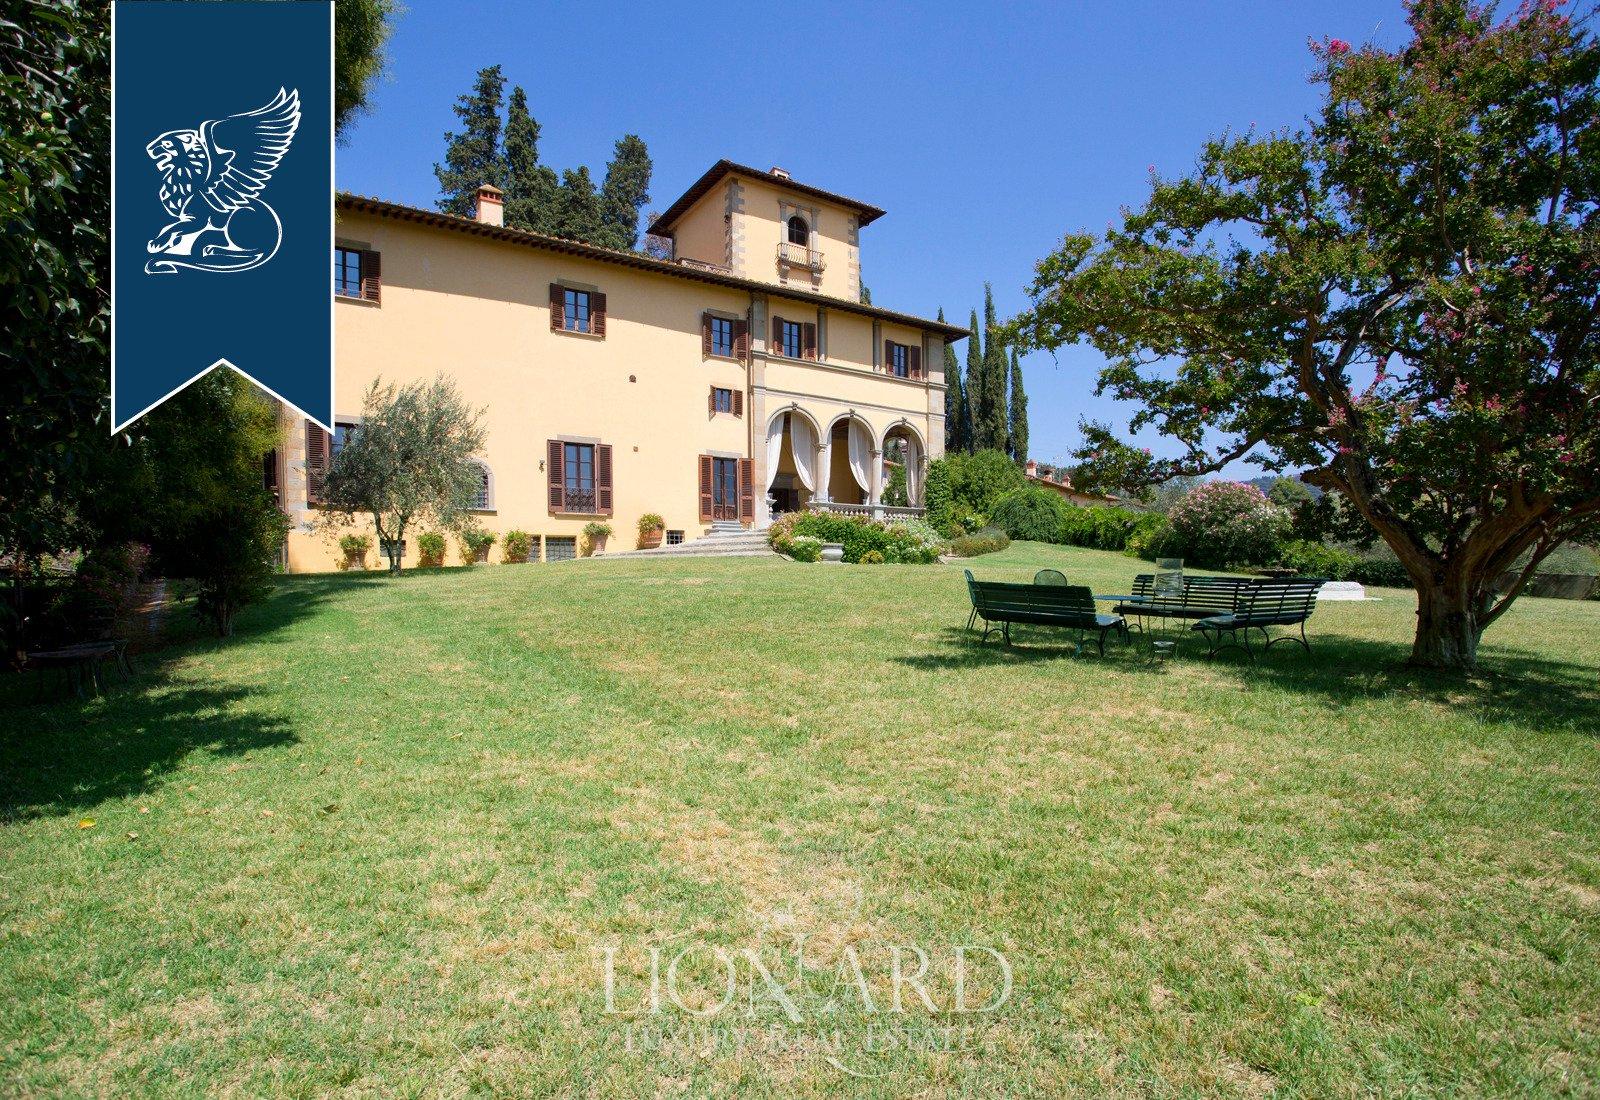 Villa in Florence, Tuscany, Italy 1 - 10918071